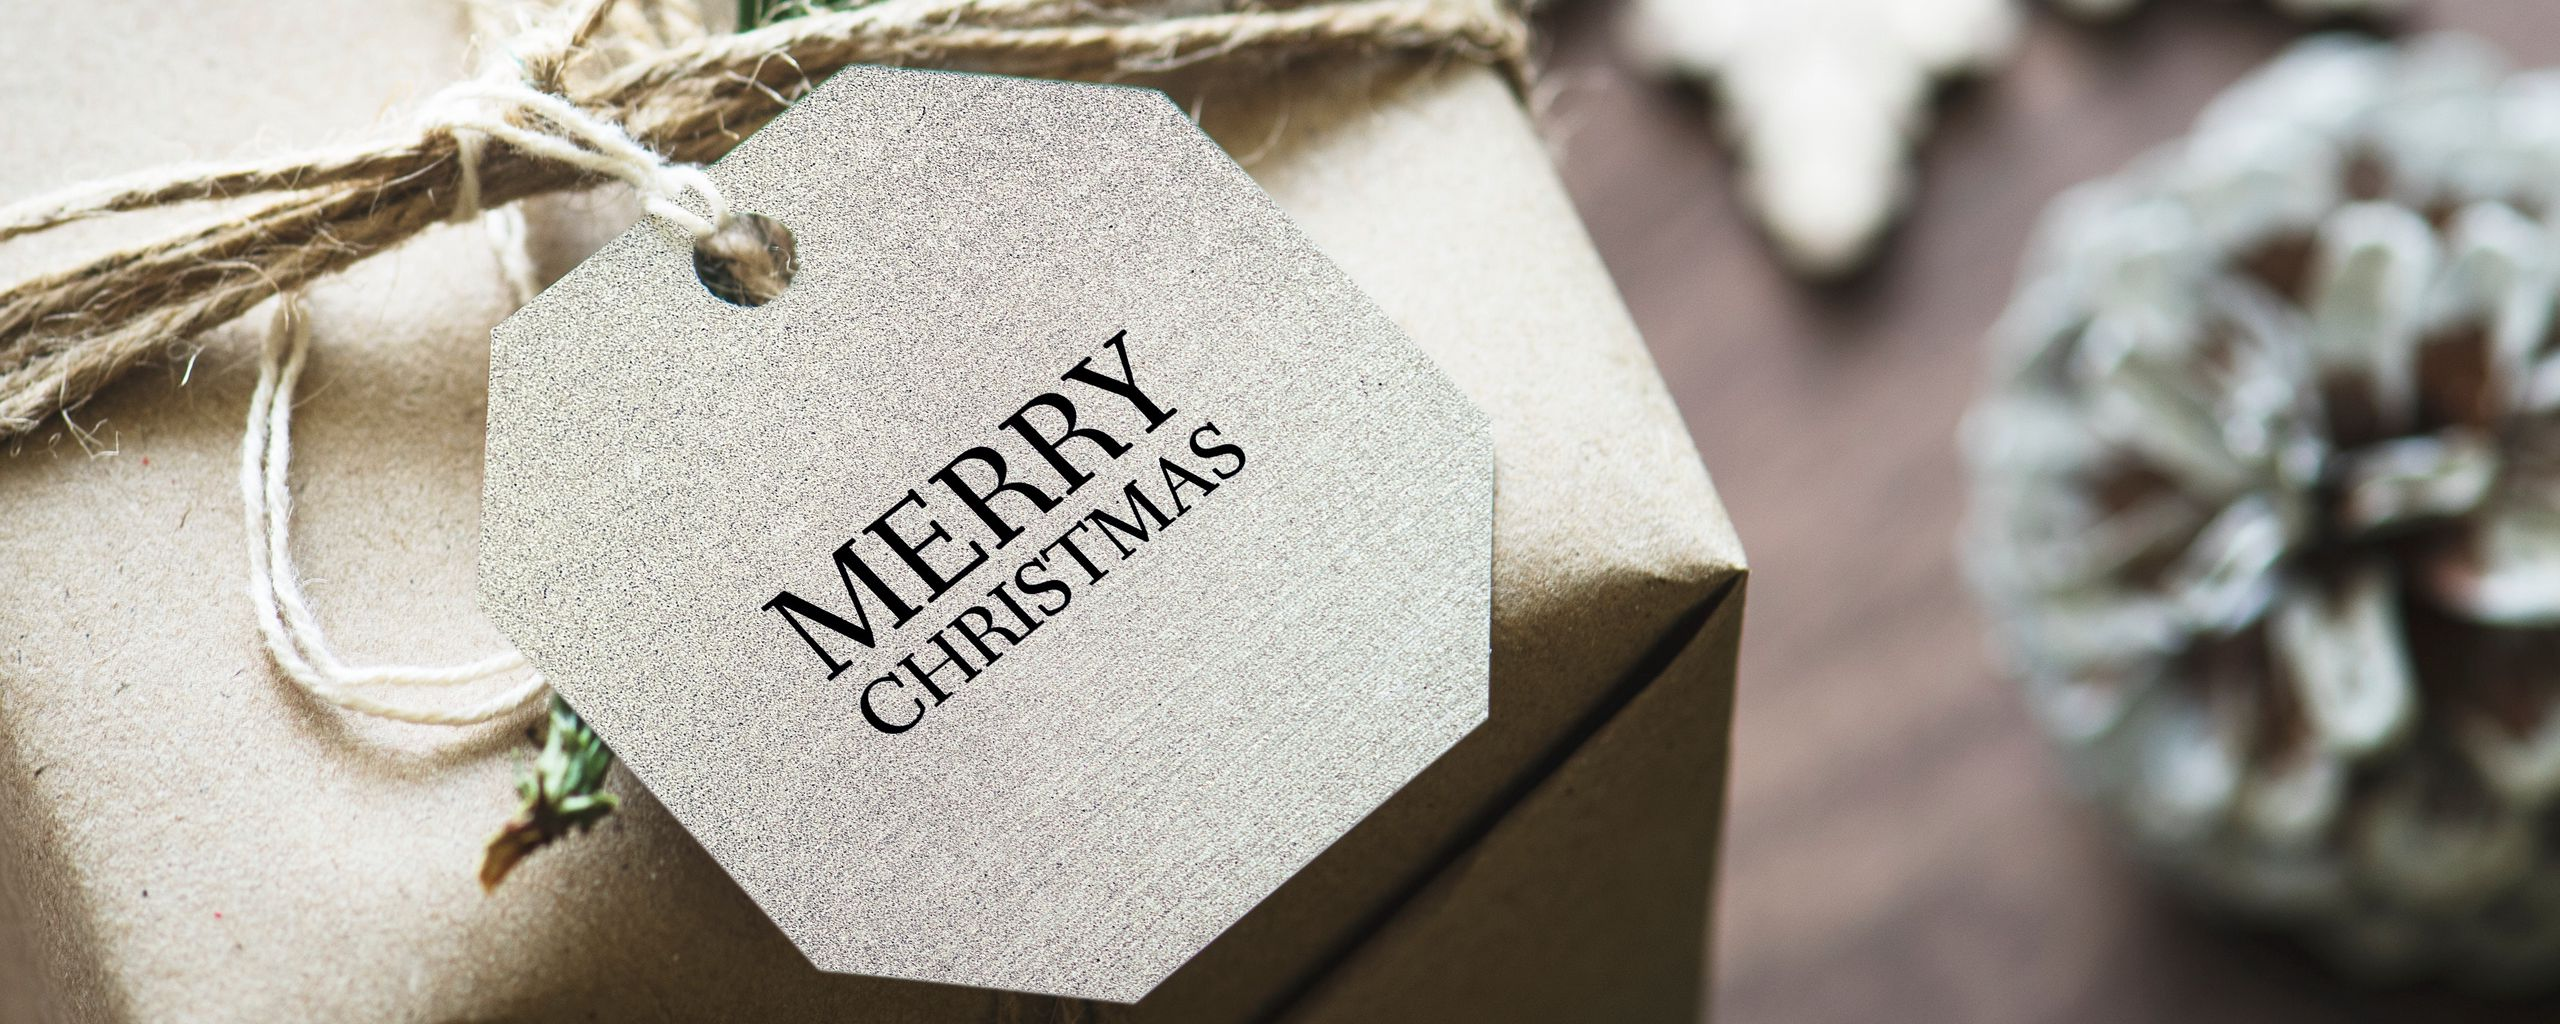 2560x1024 Wallpaper gift, christmas, new year, tag, box